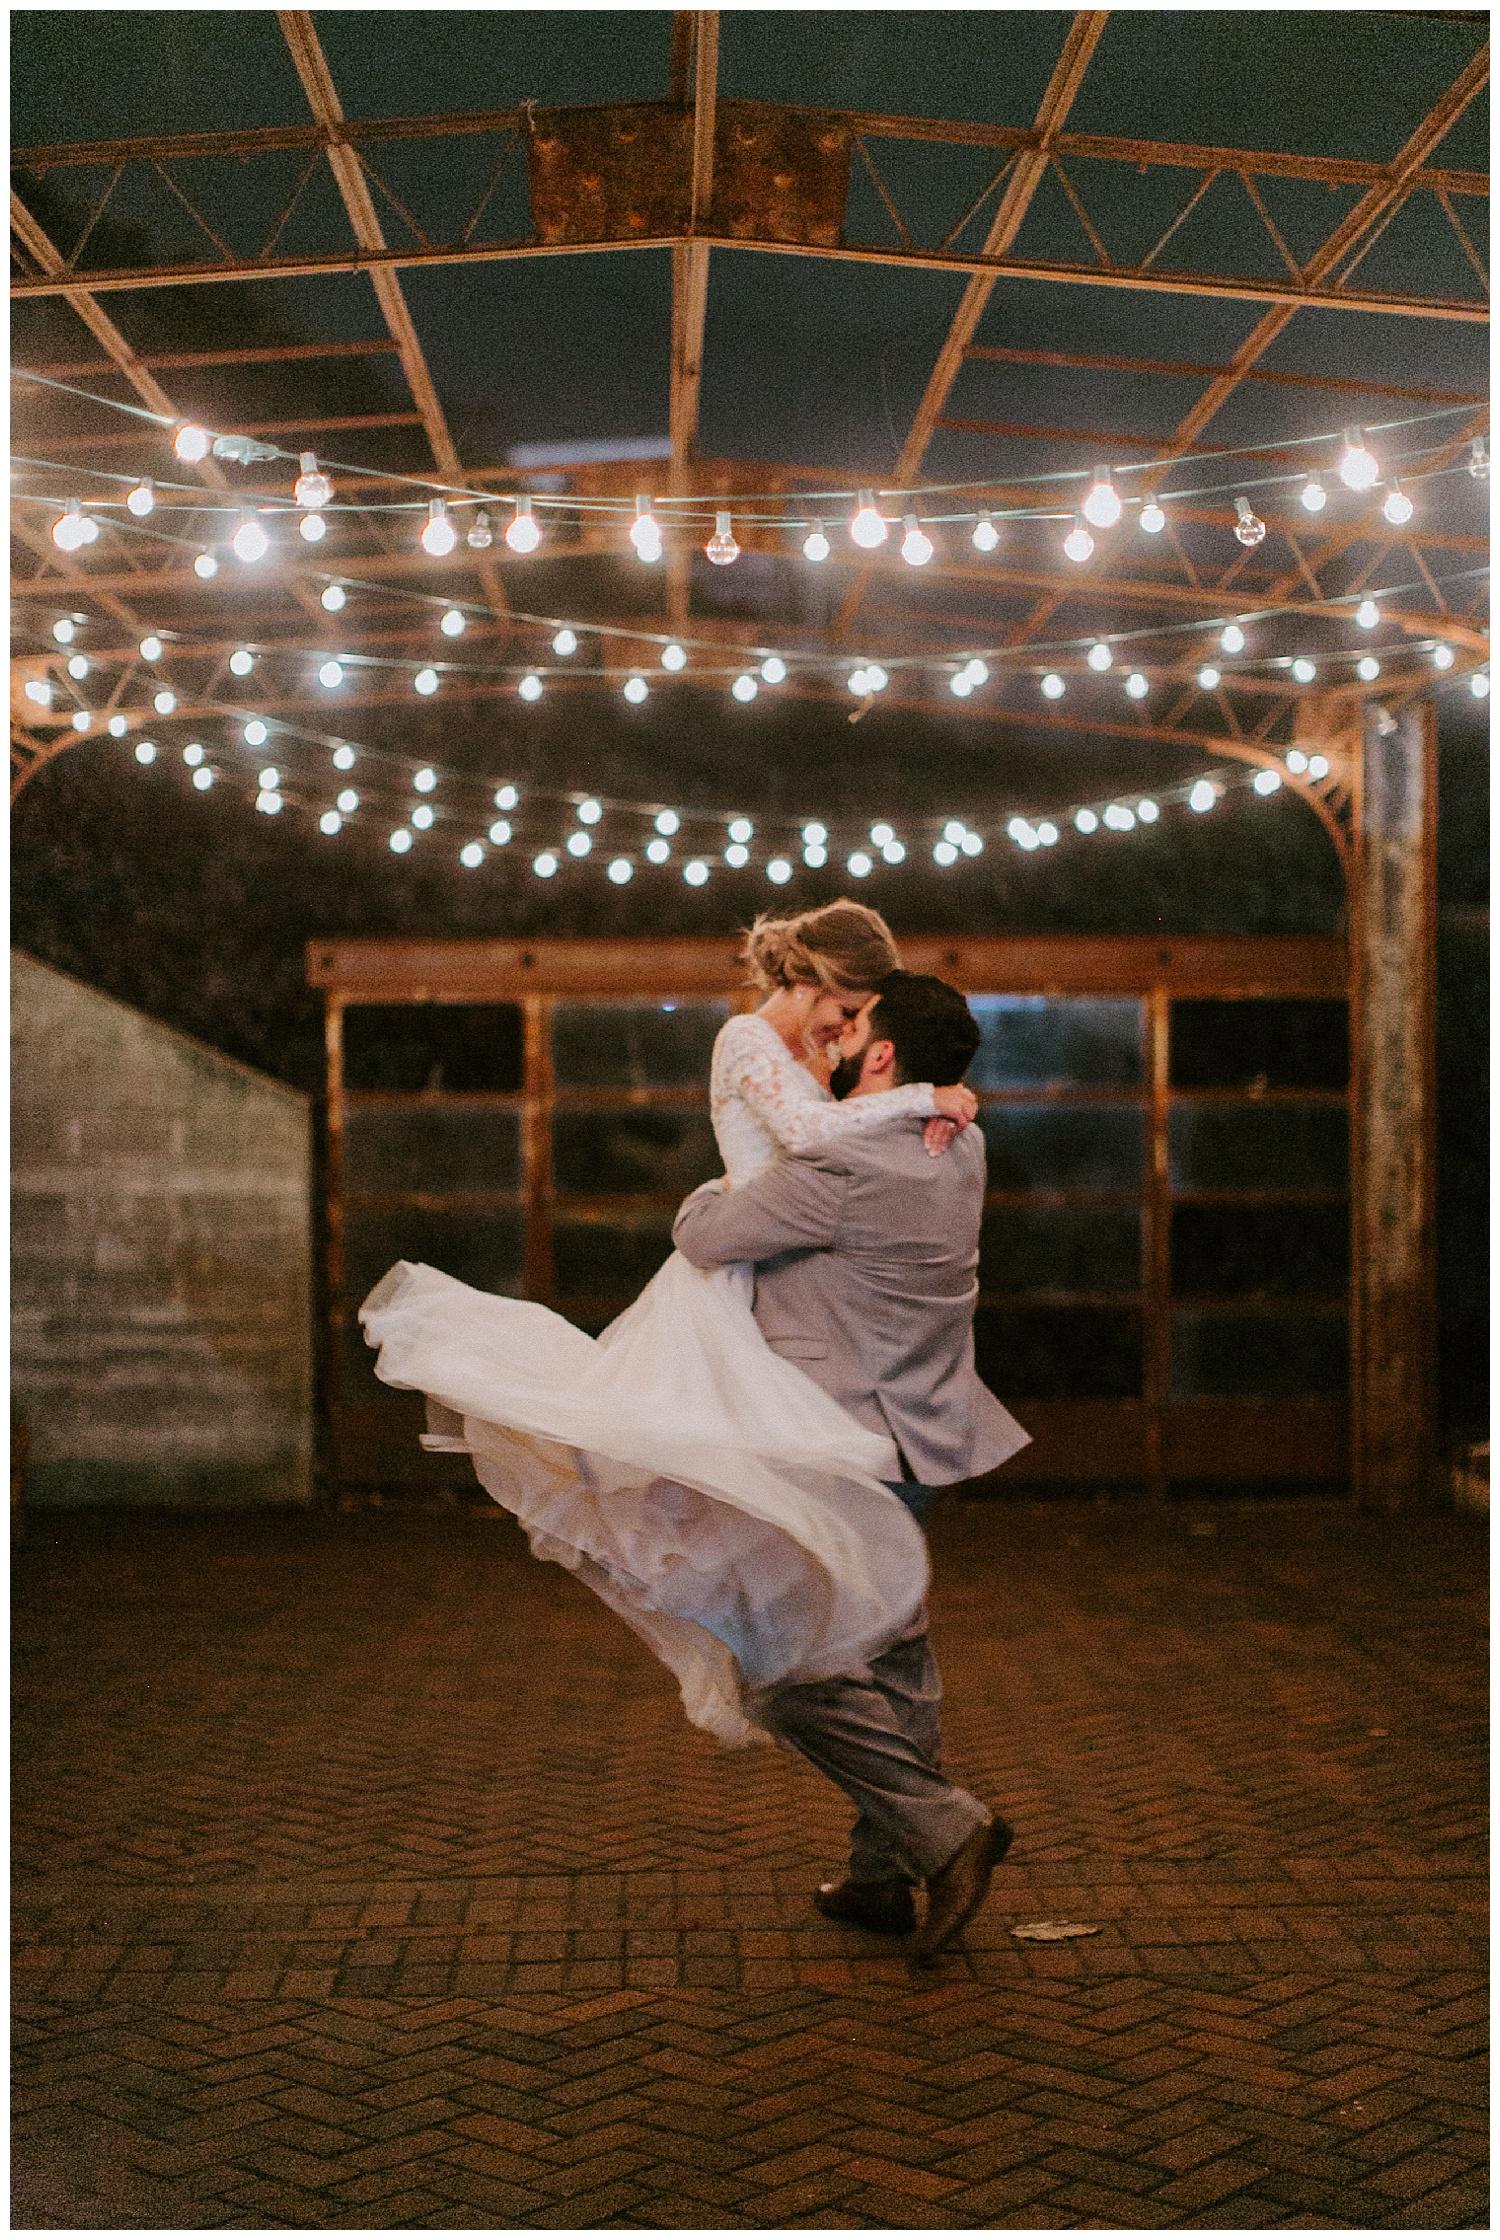 winter-wedding-the standard-knoxville_2019-01-23_0088.jpg